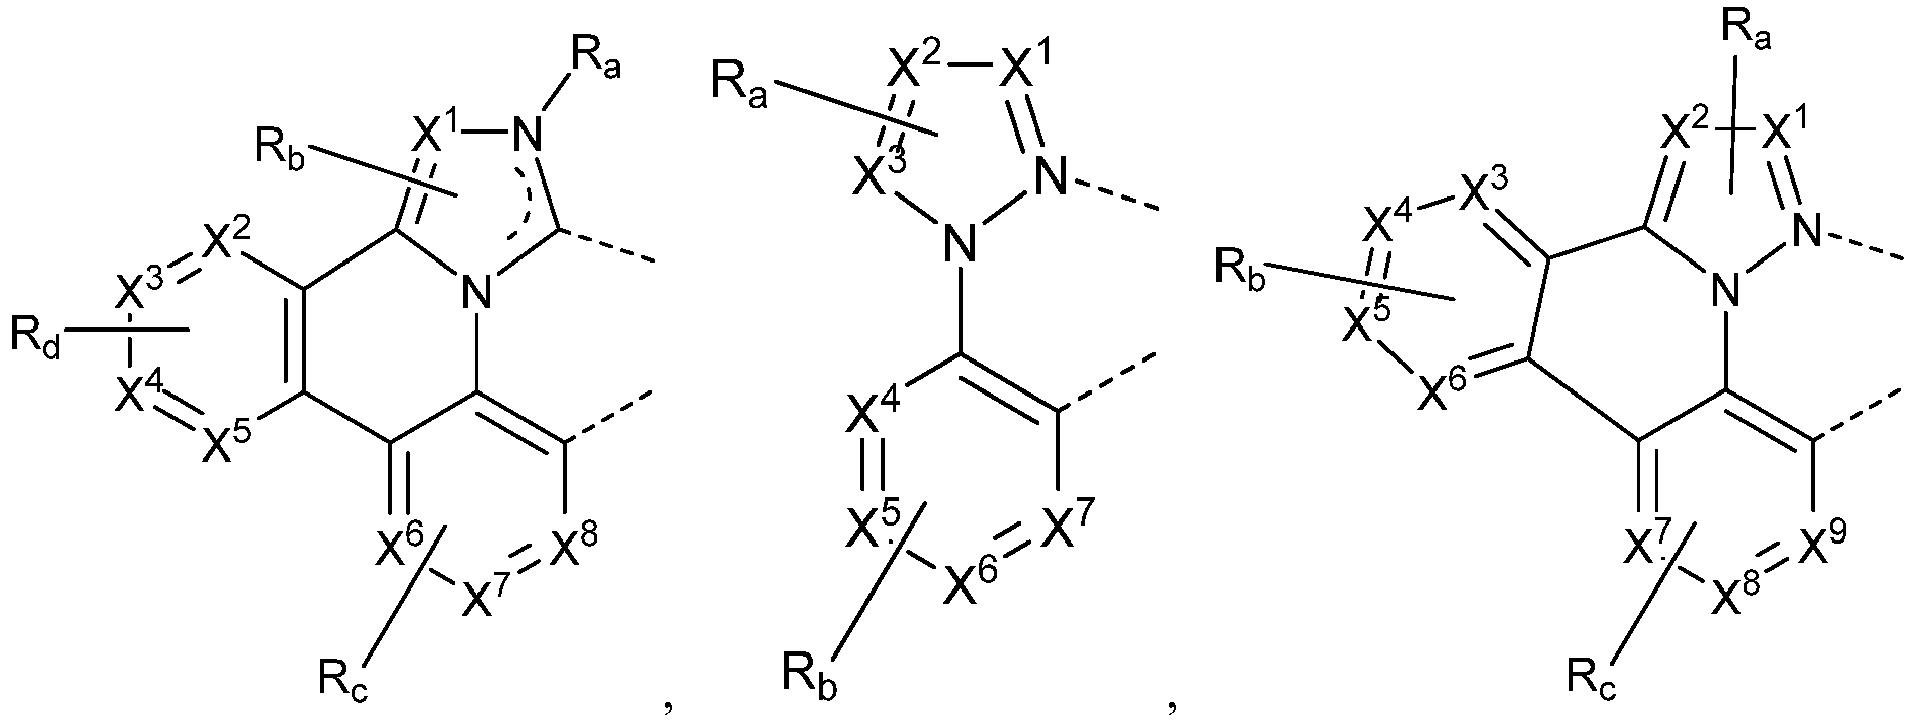 Figure imgb0783